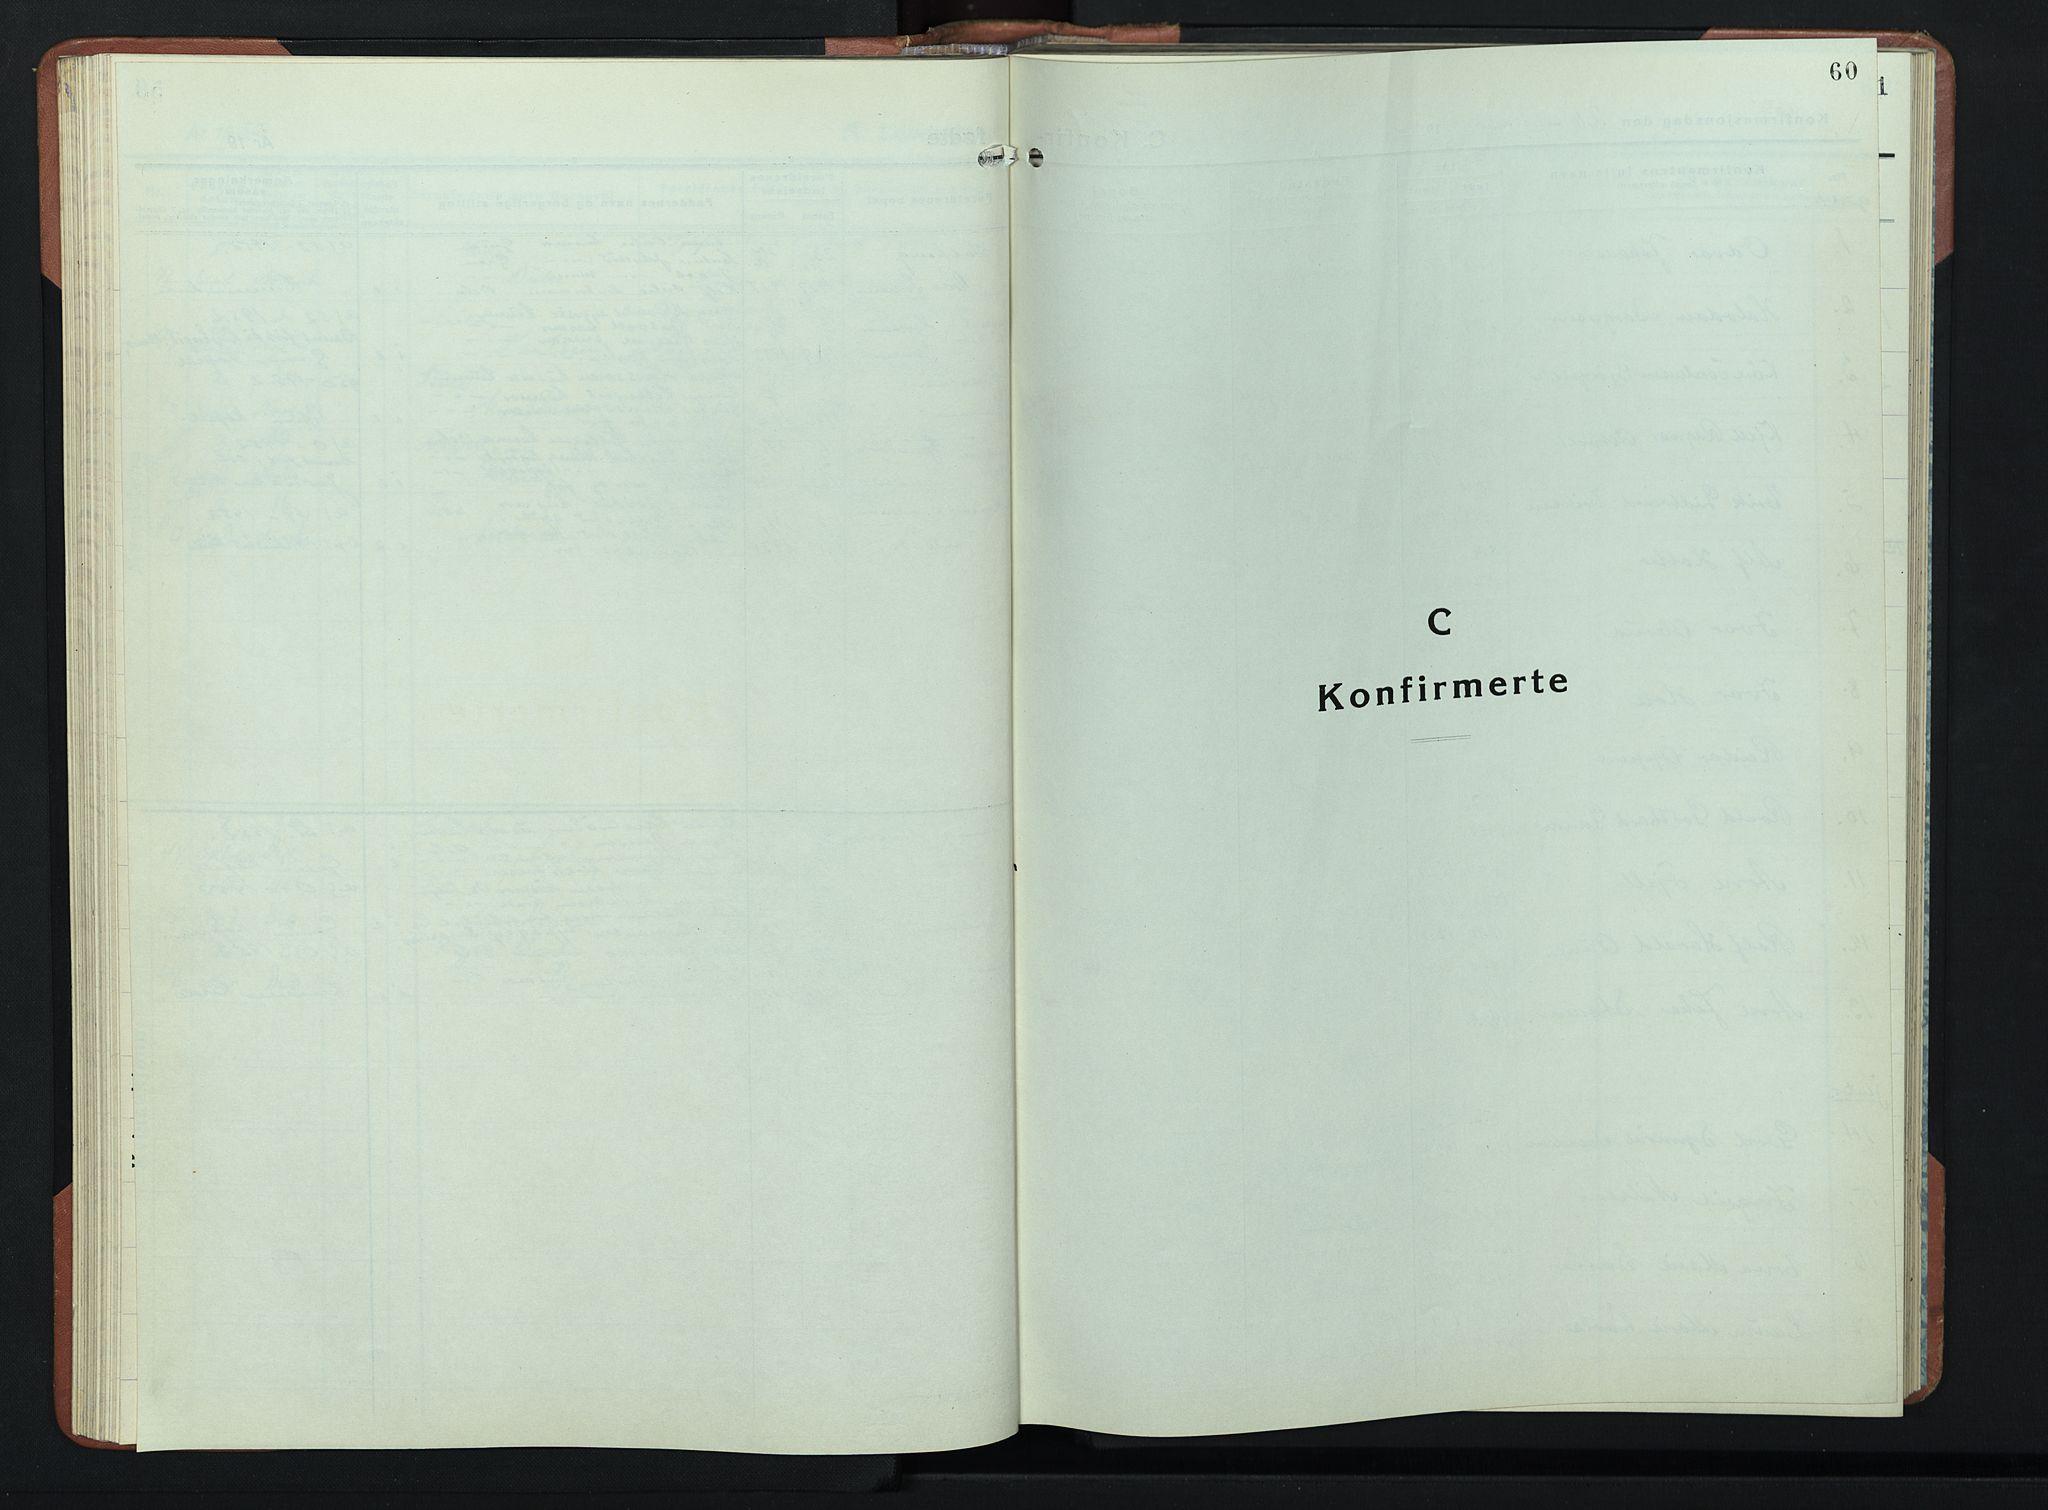 SAH, Lunner prestekontor, H/Ha/Hab/L0004: Klokkerbok nr. 4, 1943-1952, s. 60